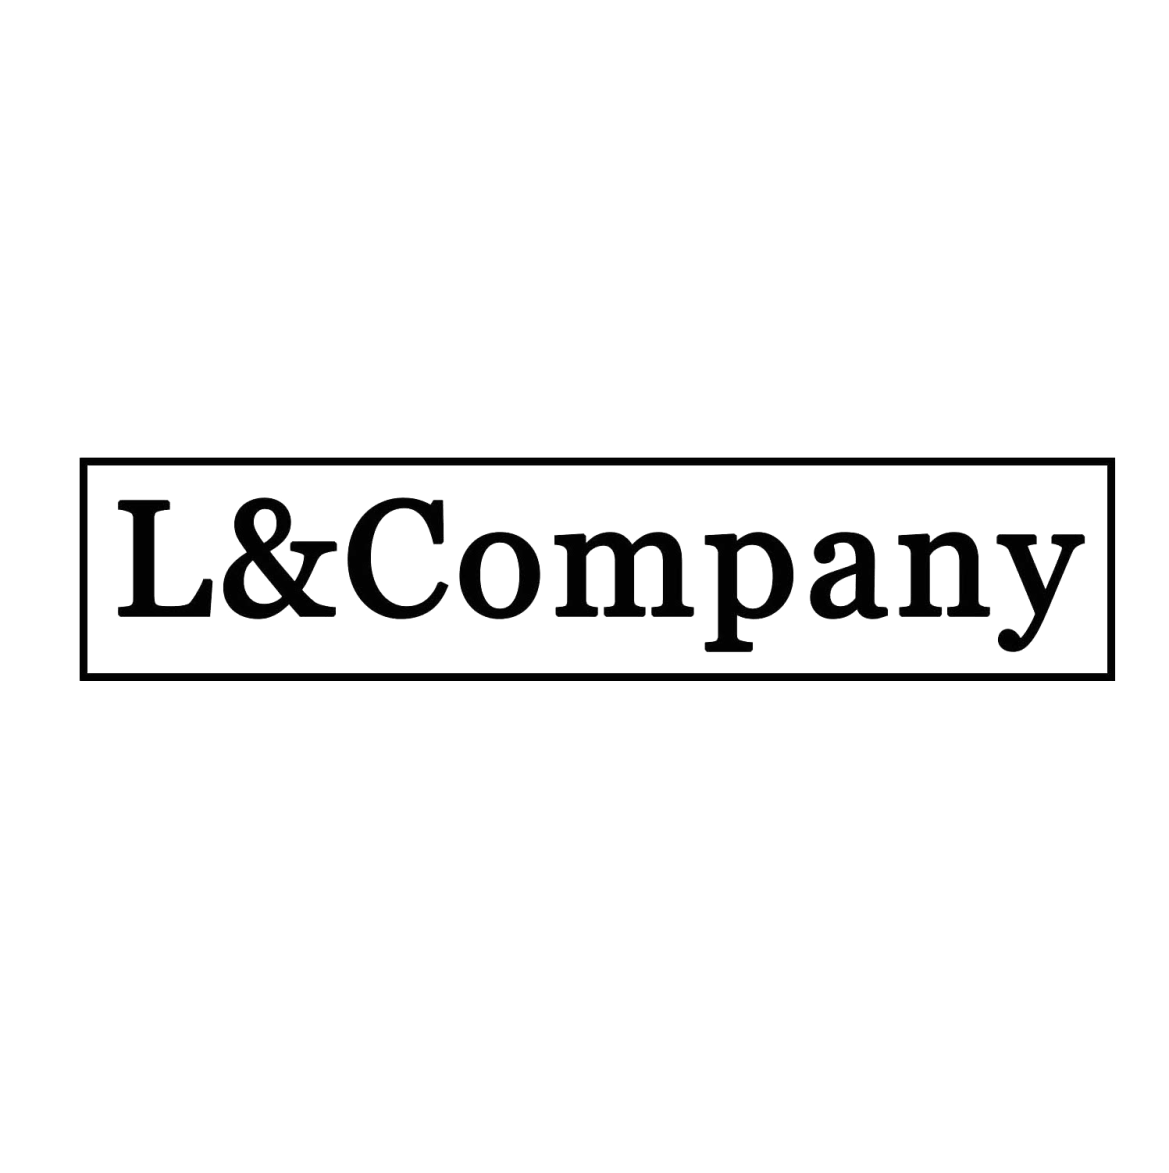 L & Company